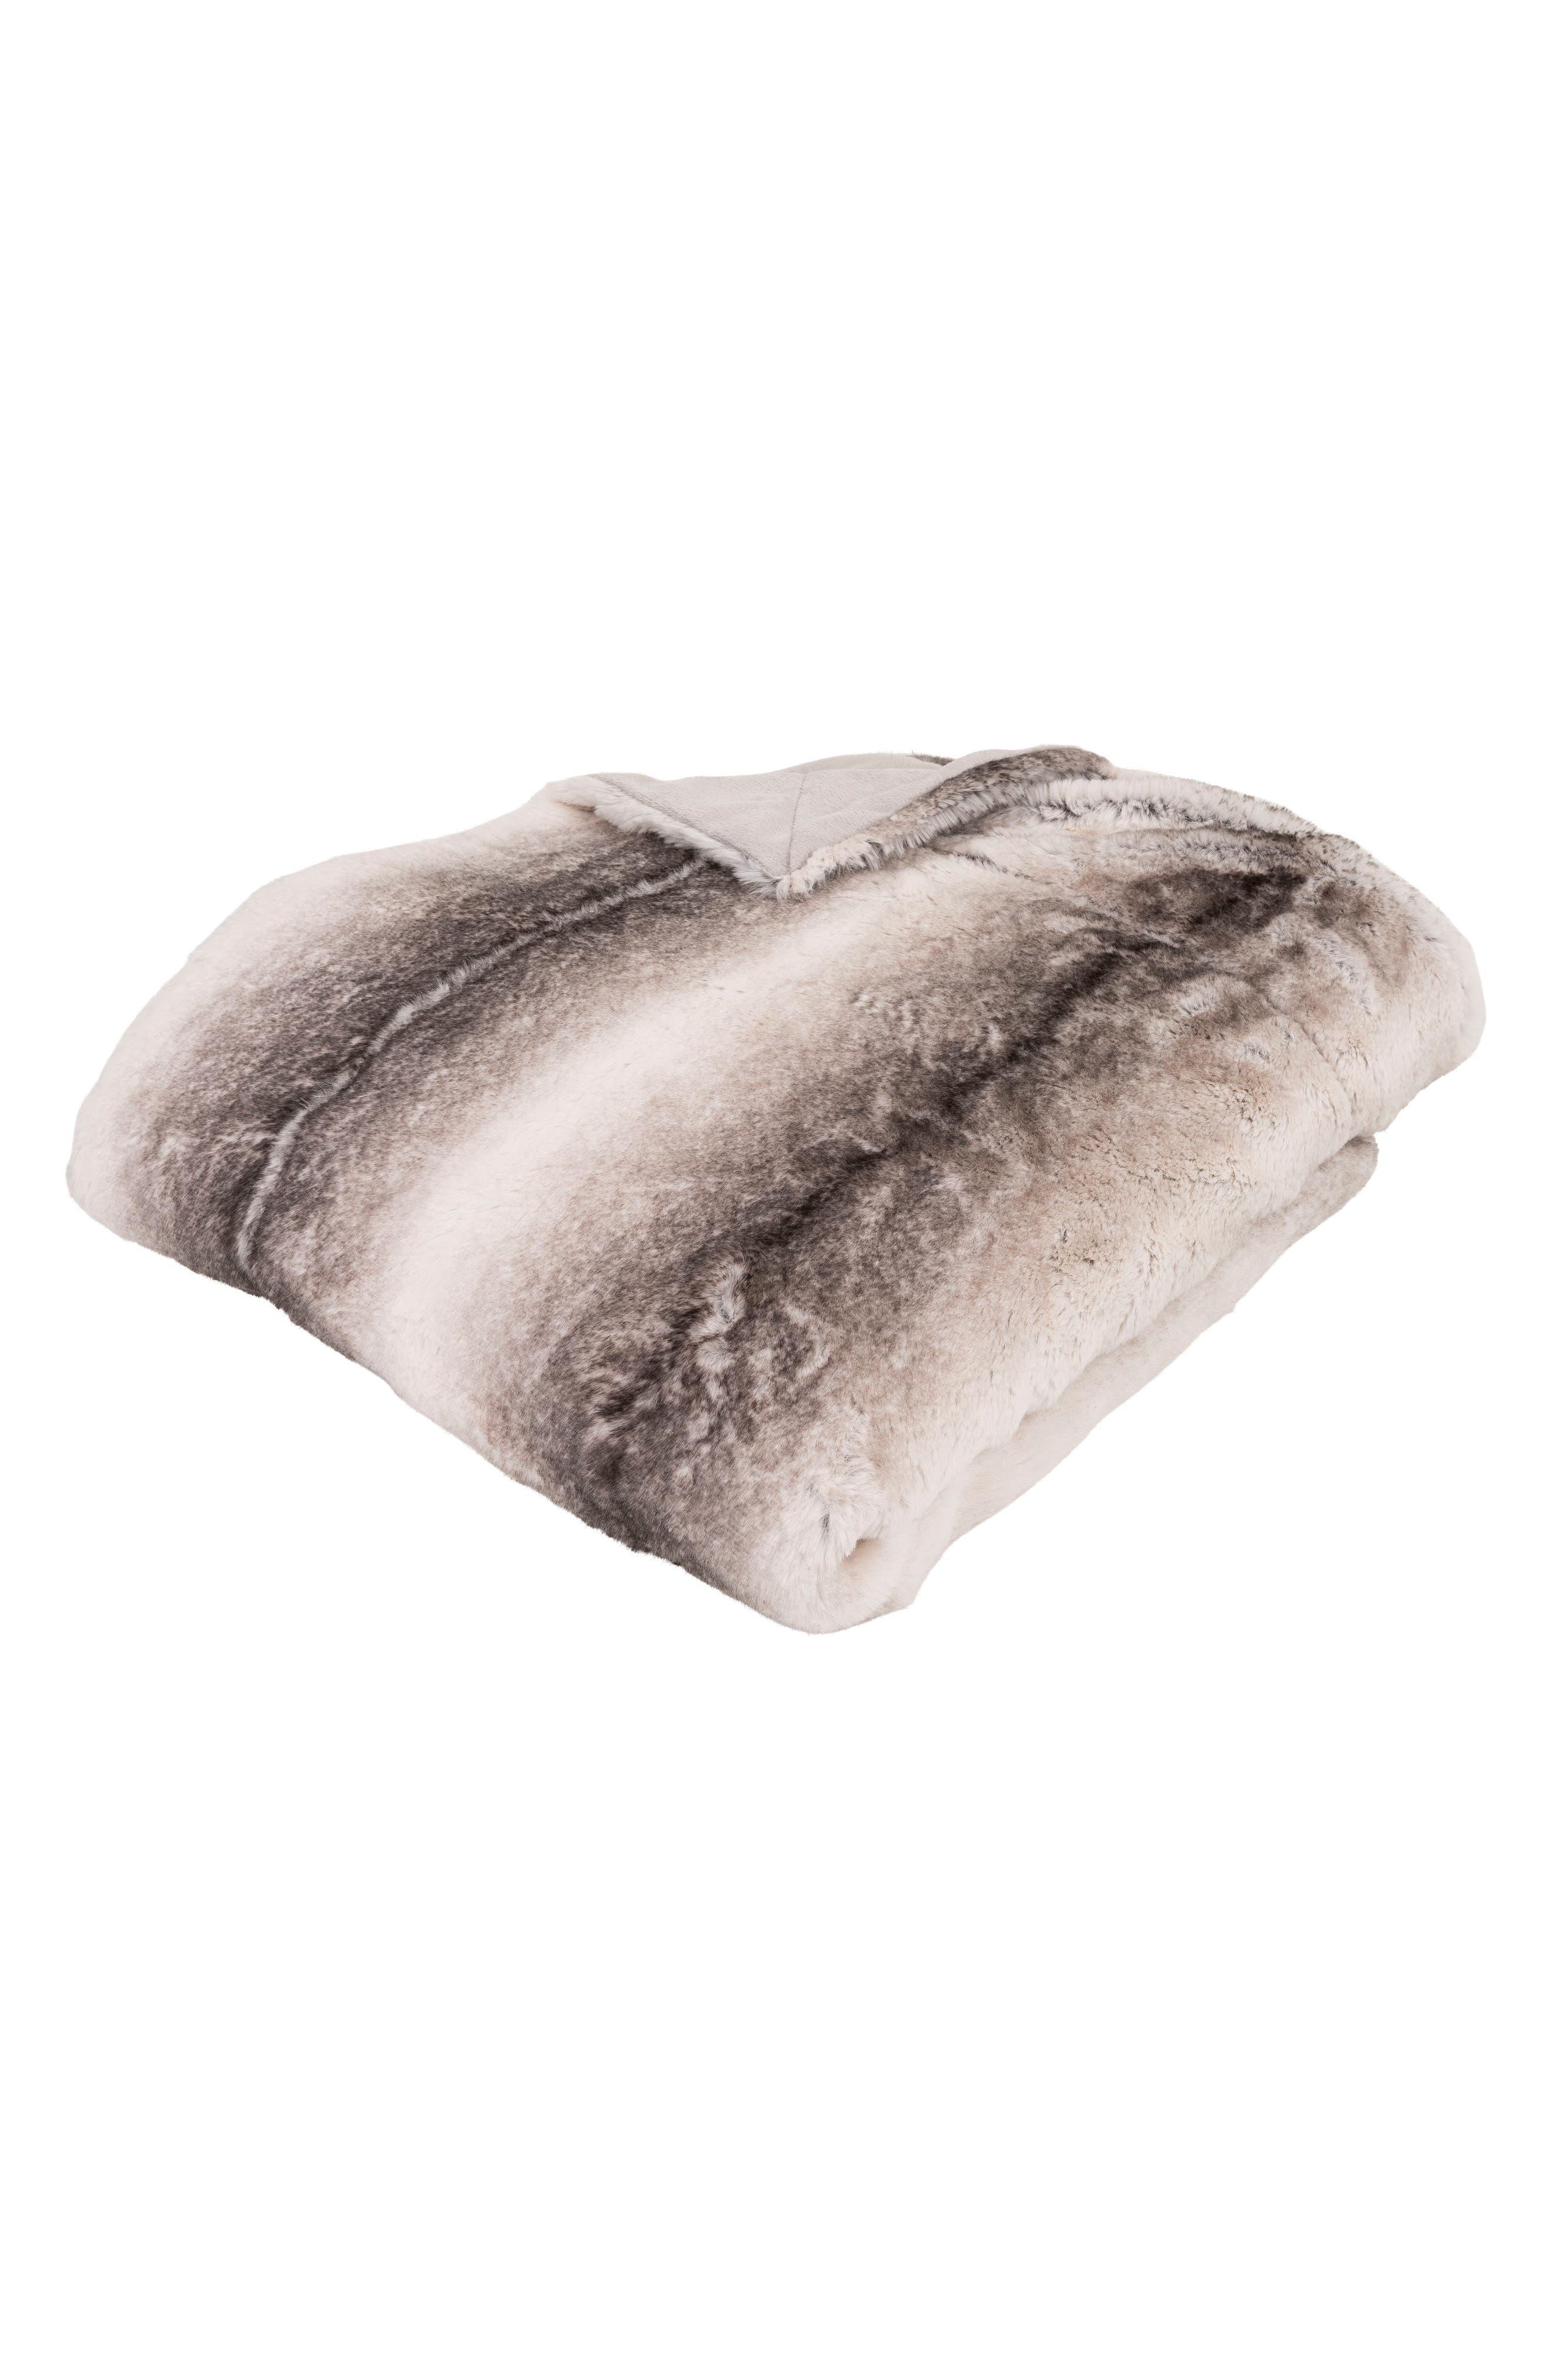 Main Image - EIGHTMOOD Wildlife Faux Fur Throw Blanket